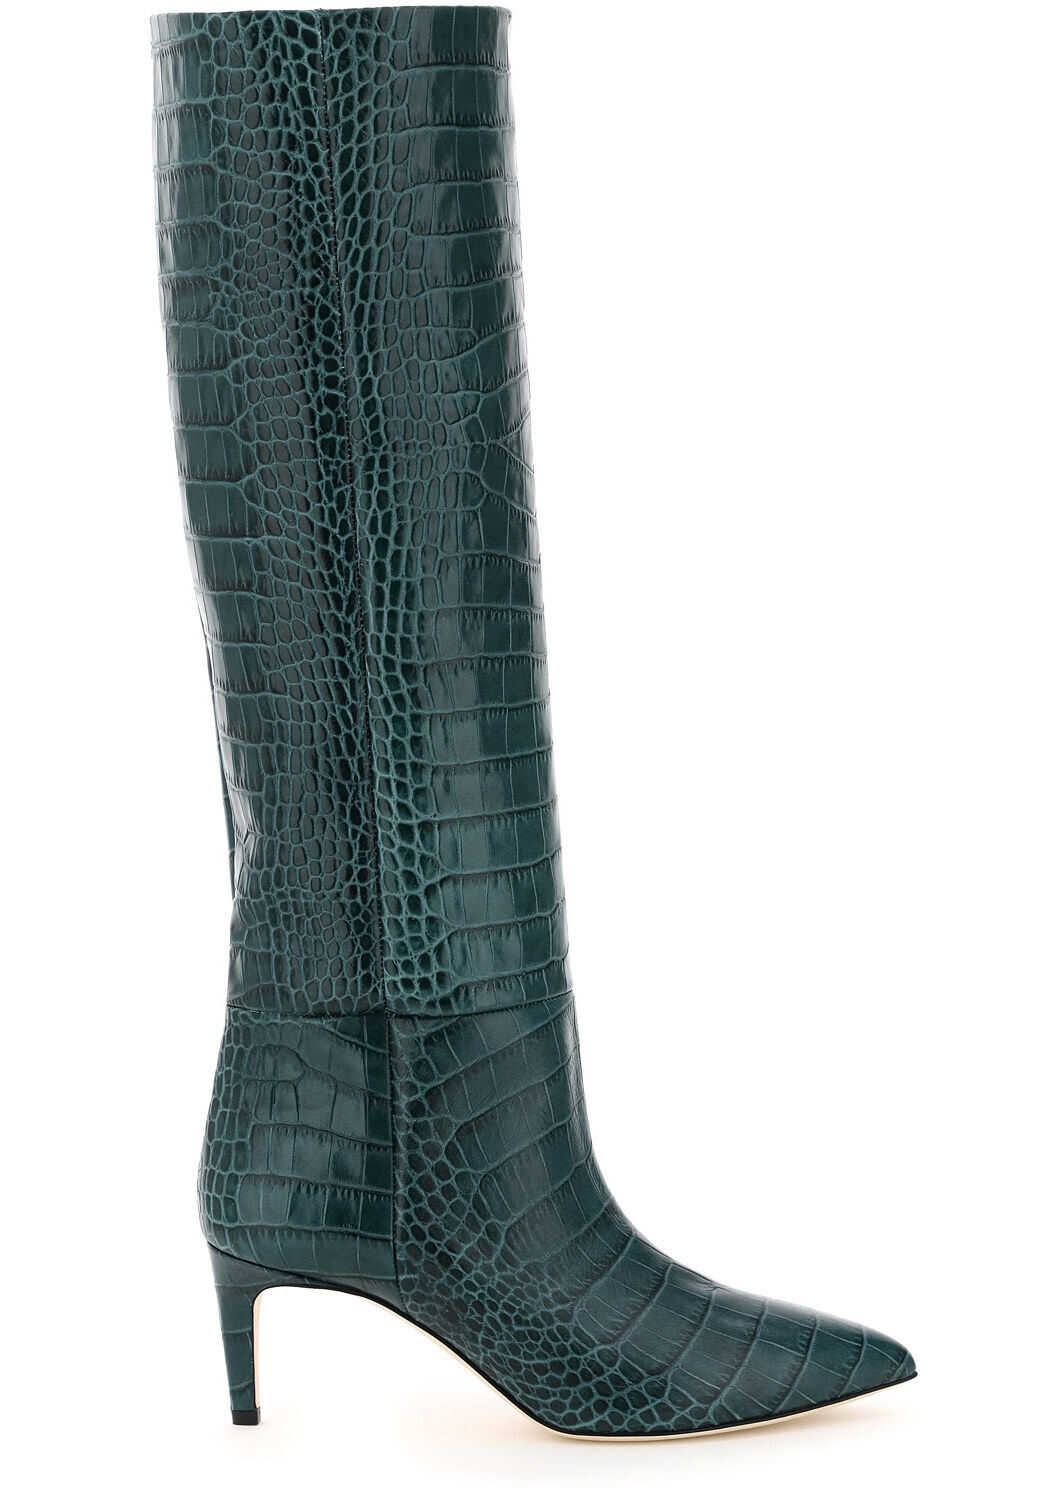 Paris Texas Crocodile-Embossed Boots PX503 XCAG2 VERDE imagine b-mall.ro